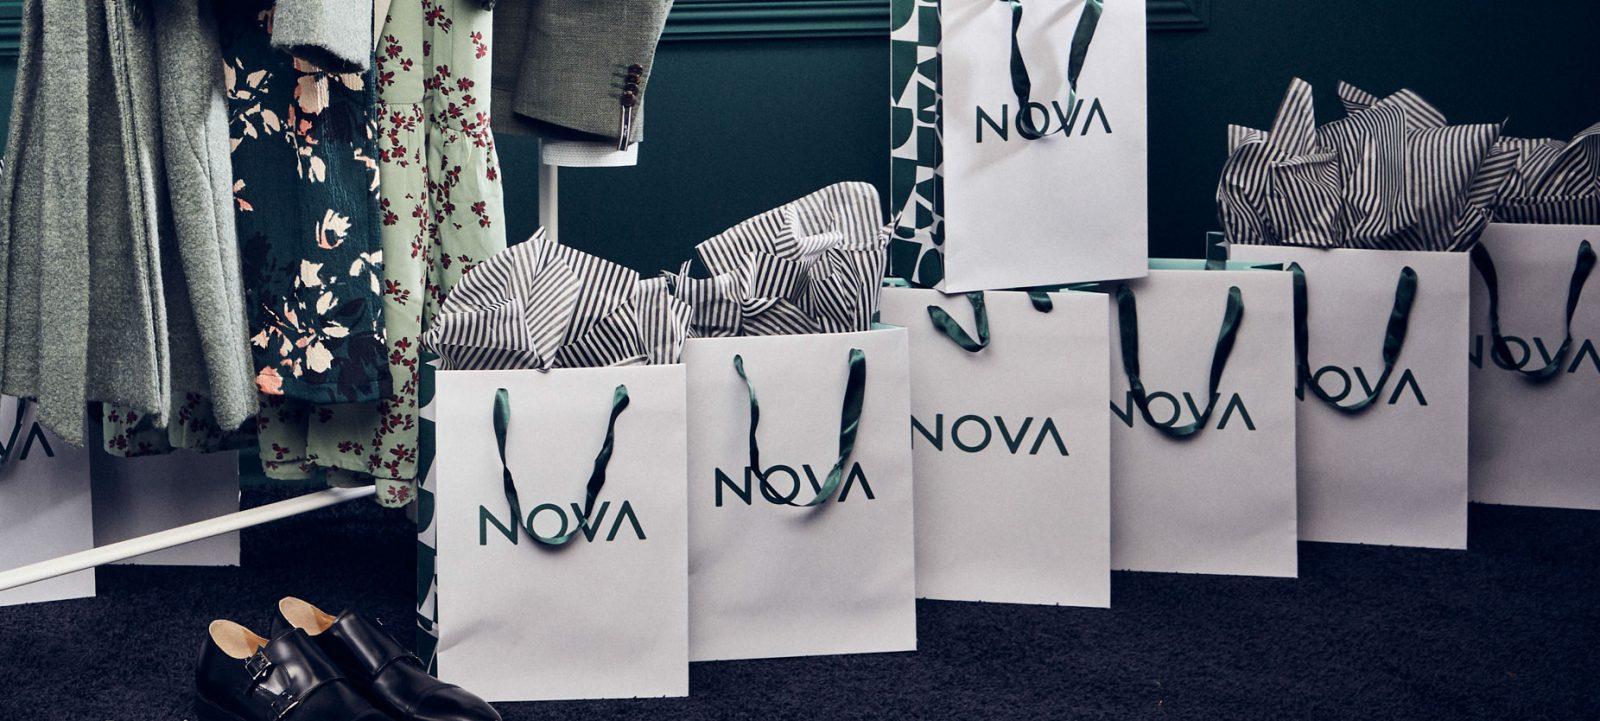 Flera nova presentpåse